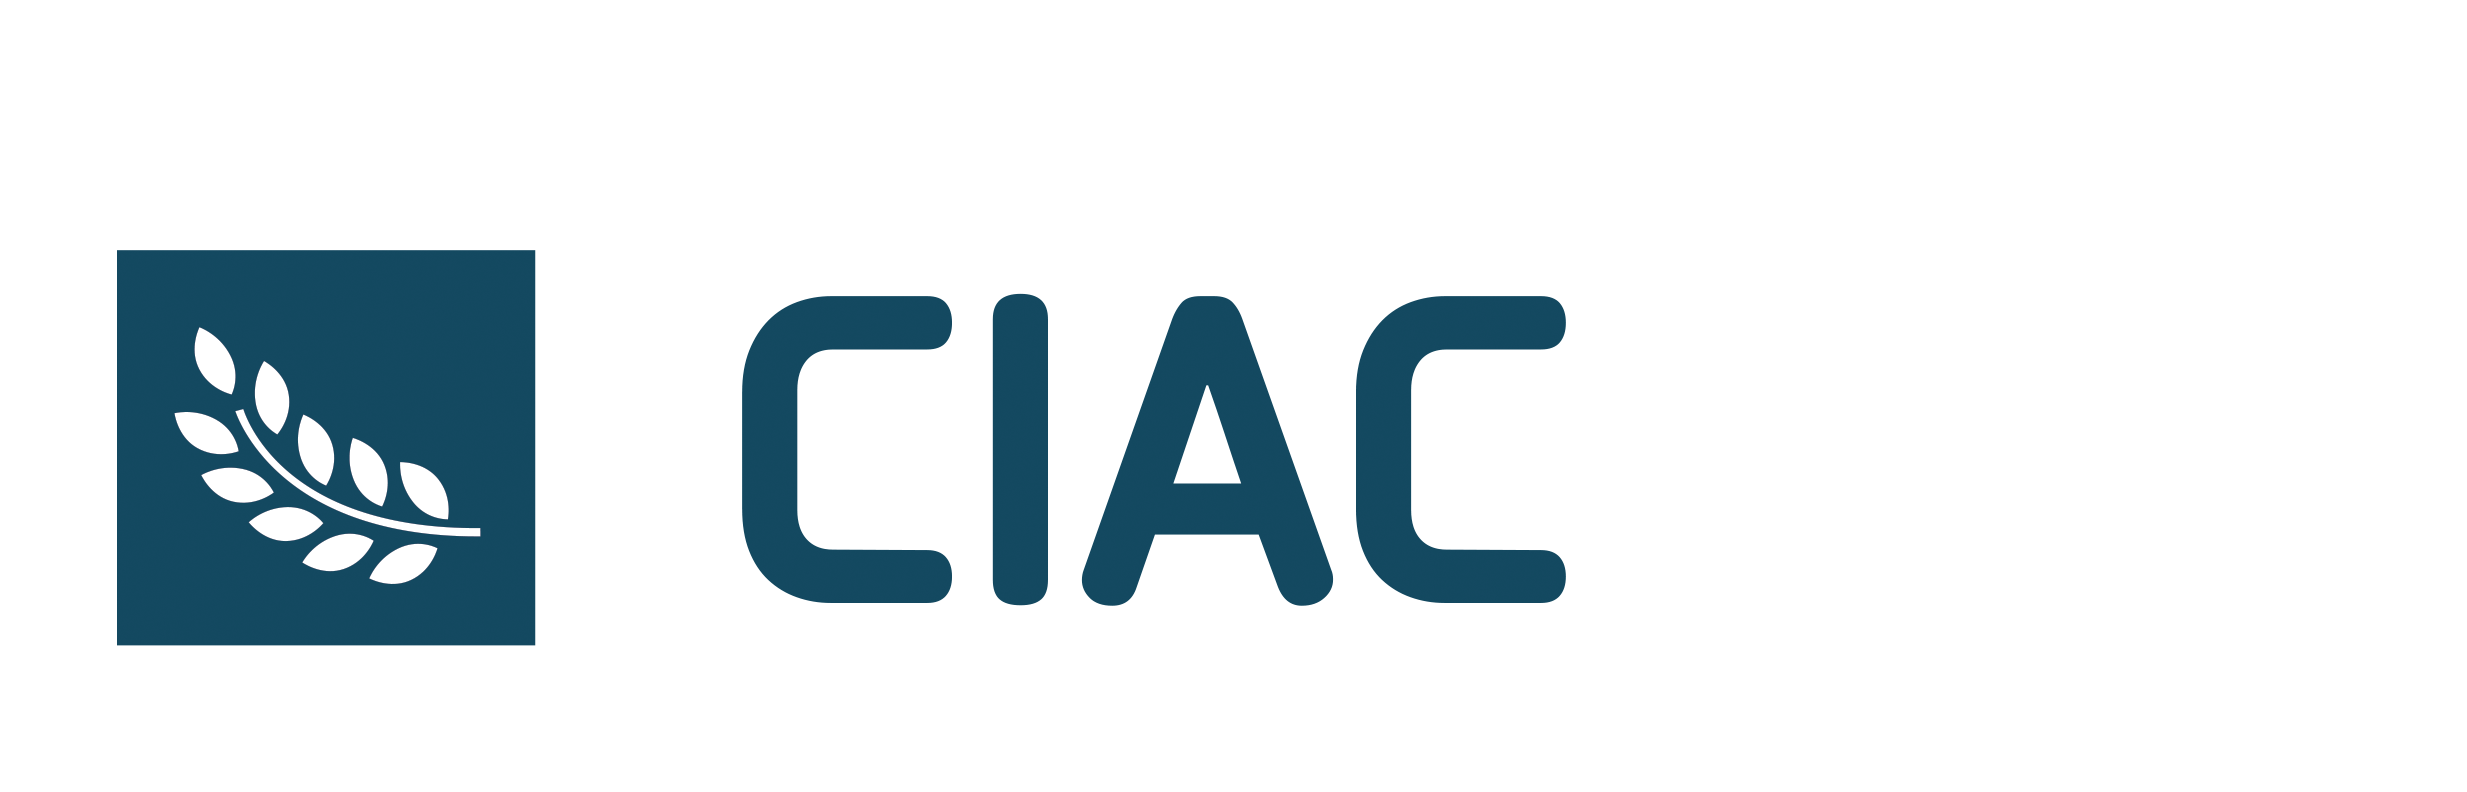 CIAC 2021